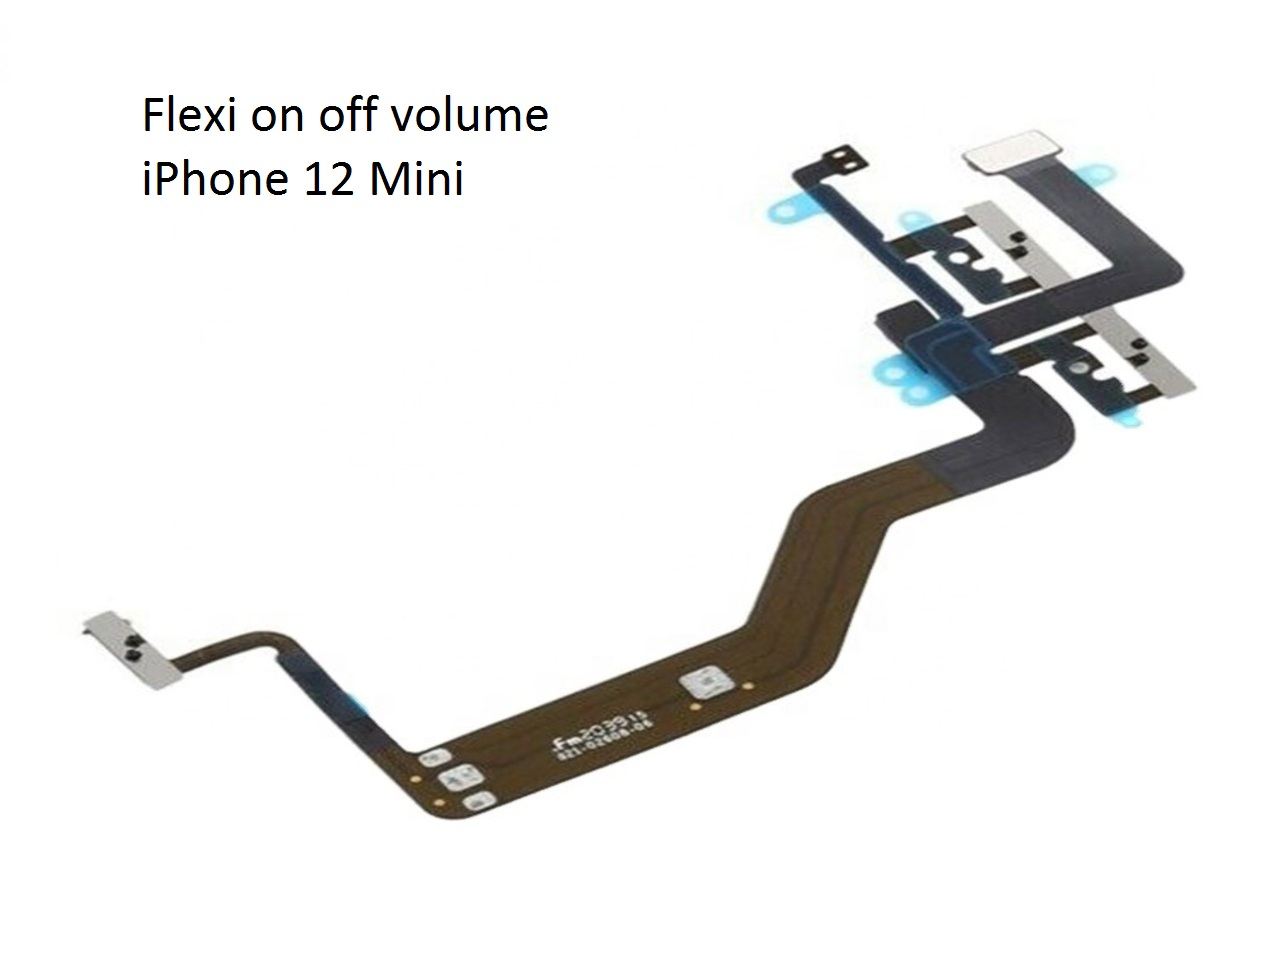 flexi on off volume iphone 12 mini